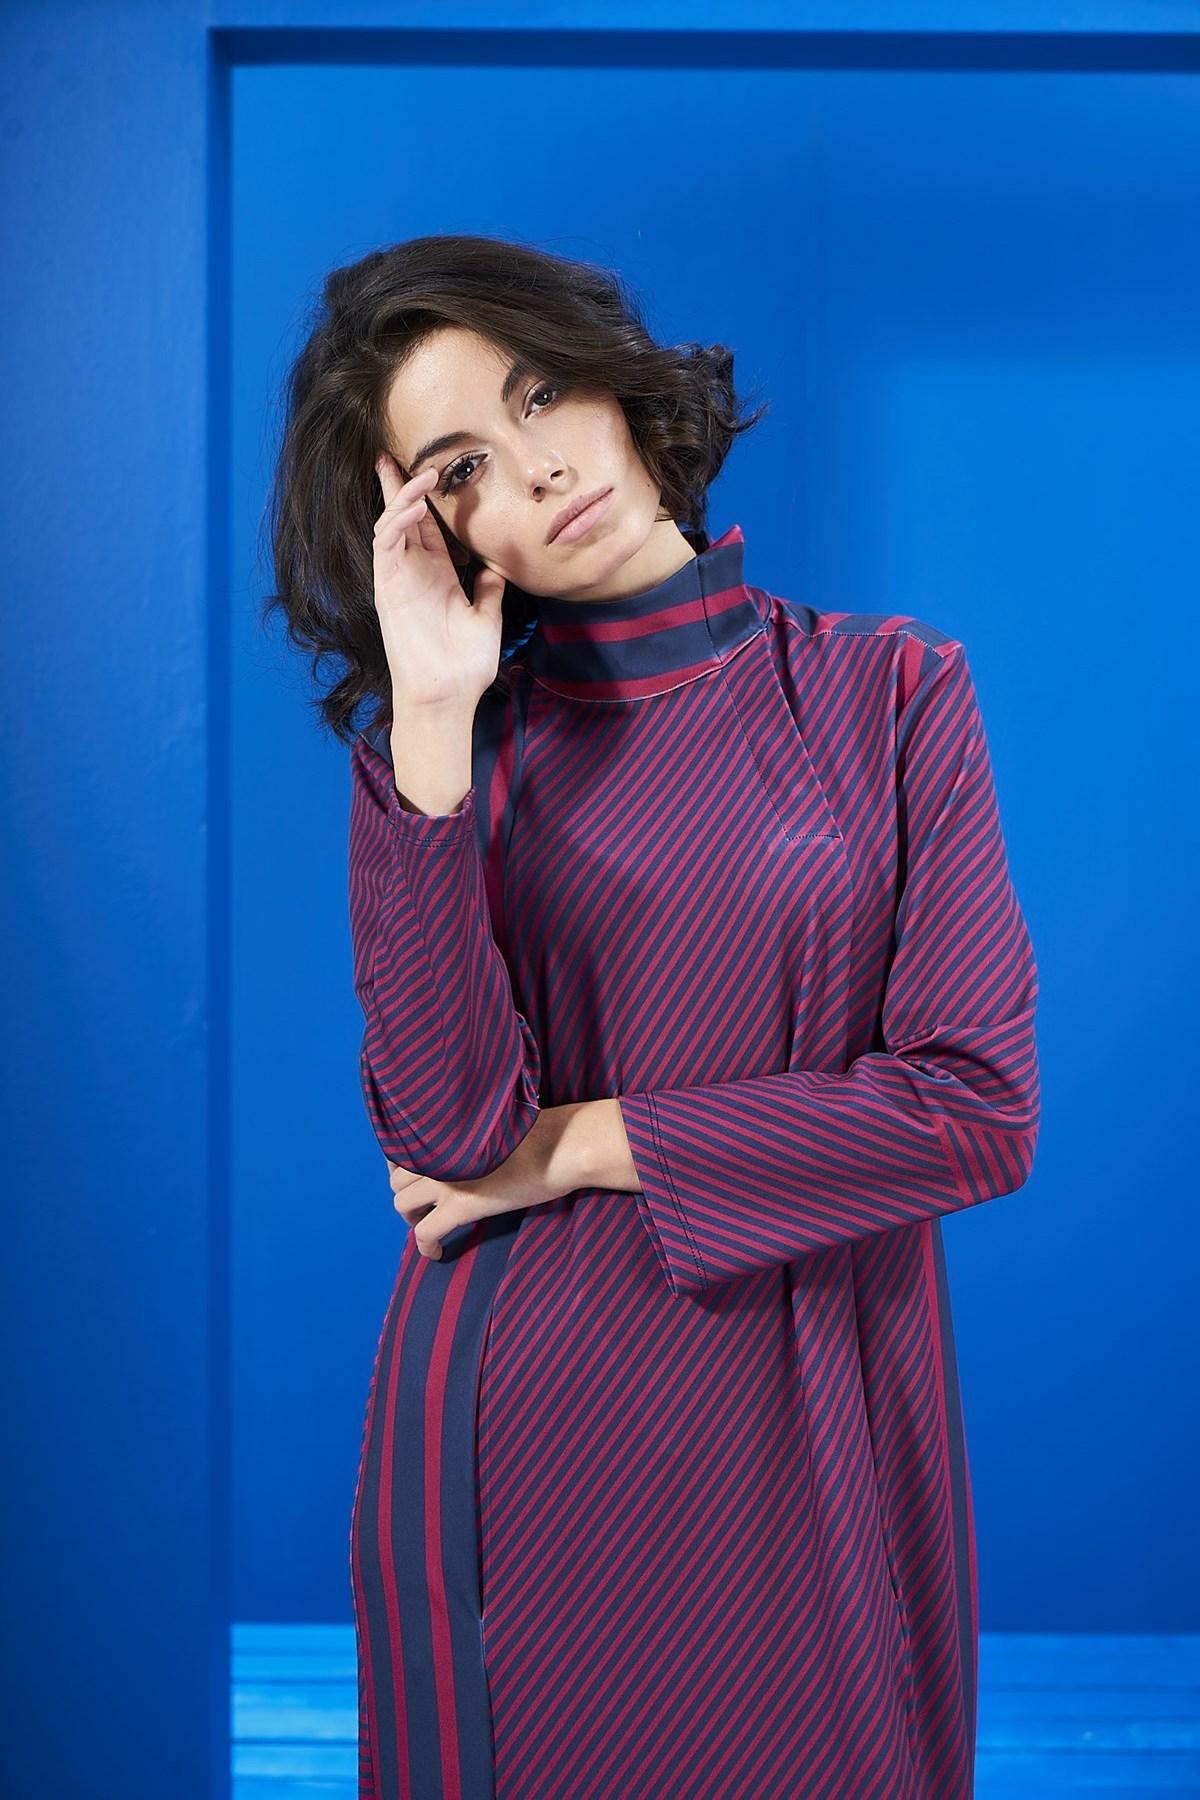 Mevra - Lacivert-Vişne Çizgili Elbise